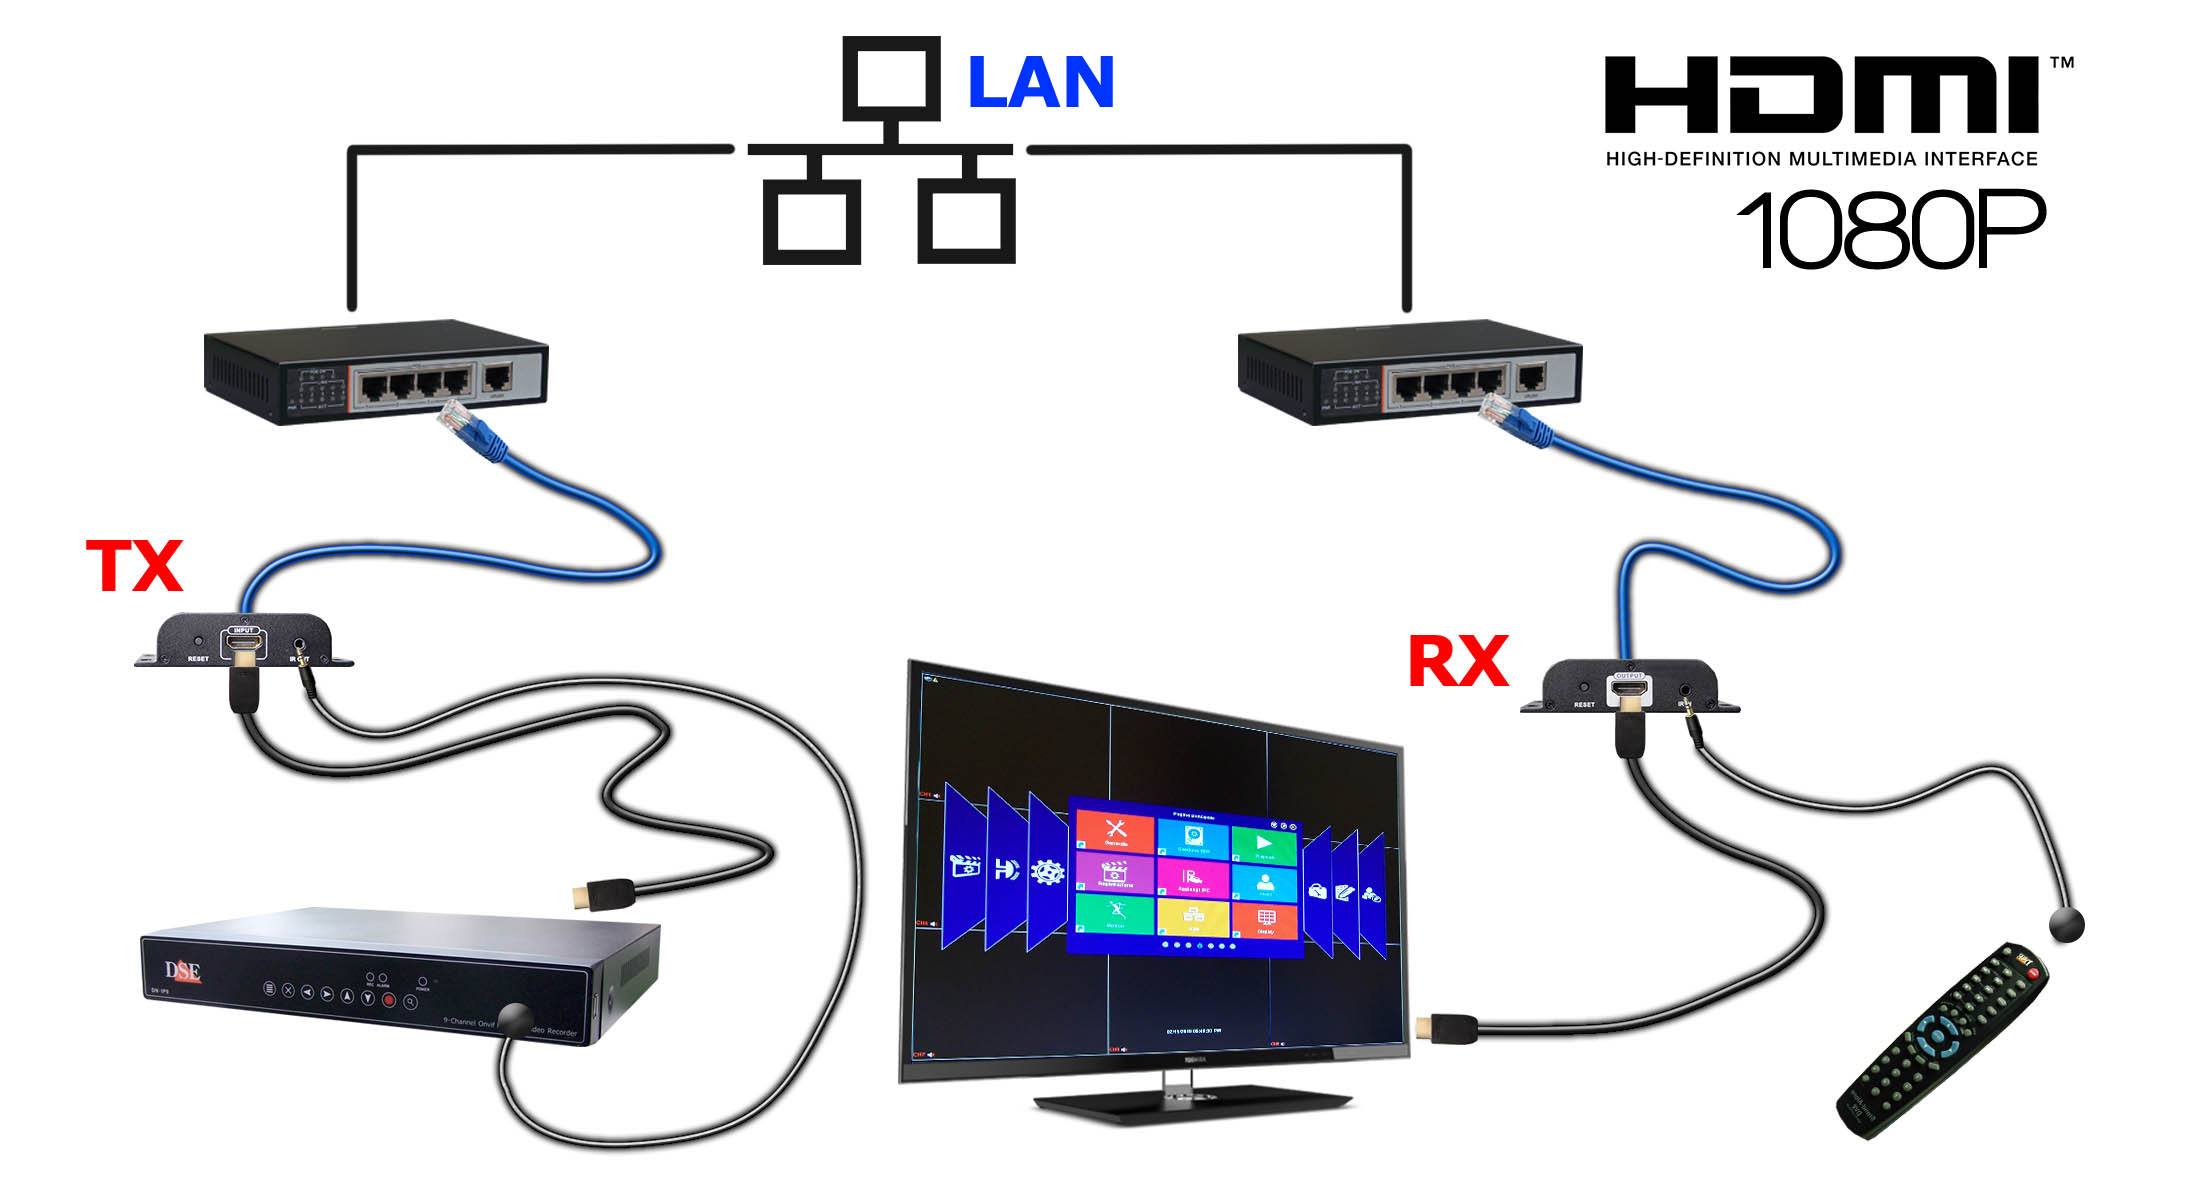 hdmi splitters hdmi amplifiers hdmi transmitters. Black Bedroom Furniture Sets. Home Design Ideas